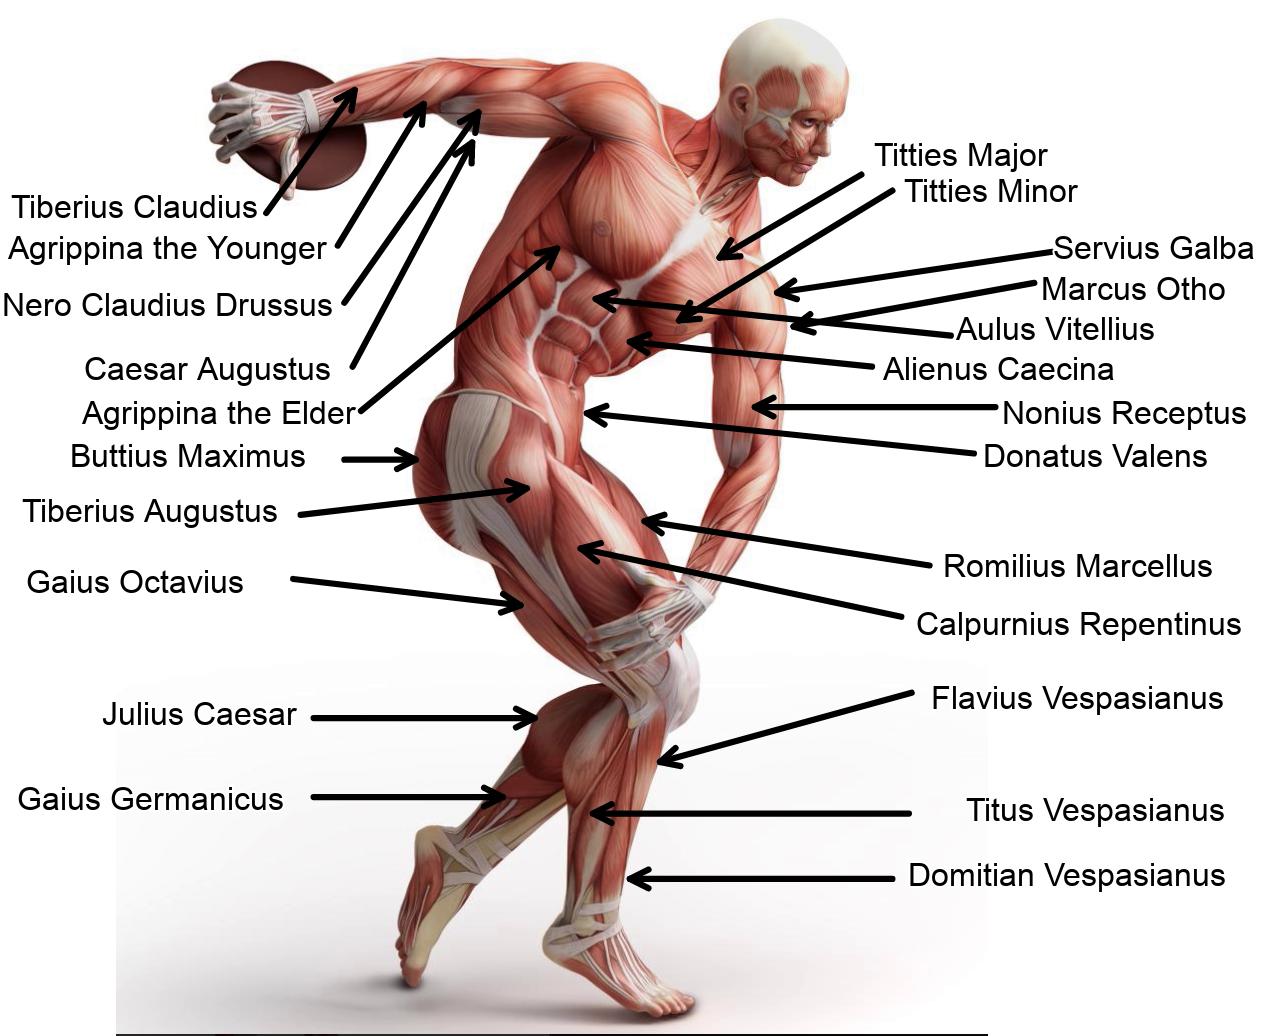 Figure 1. Pre-plie Muscle Man (qumpapilla sinephallus)